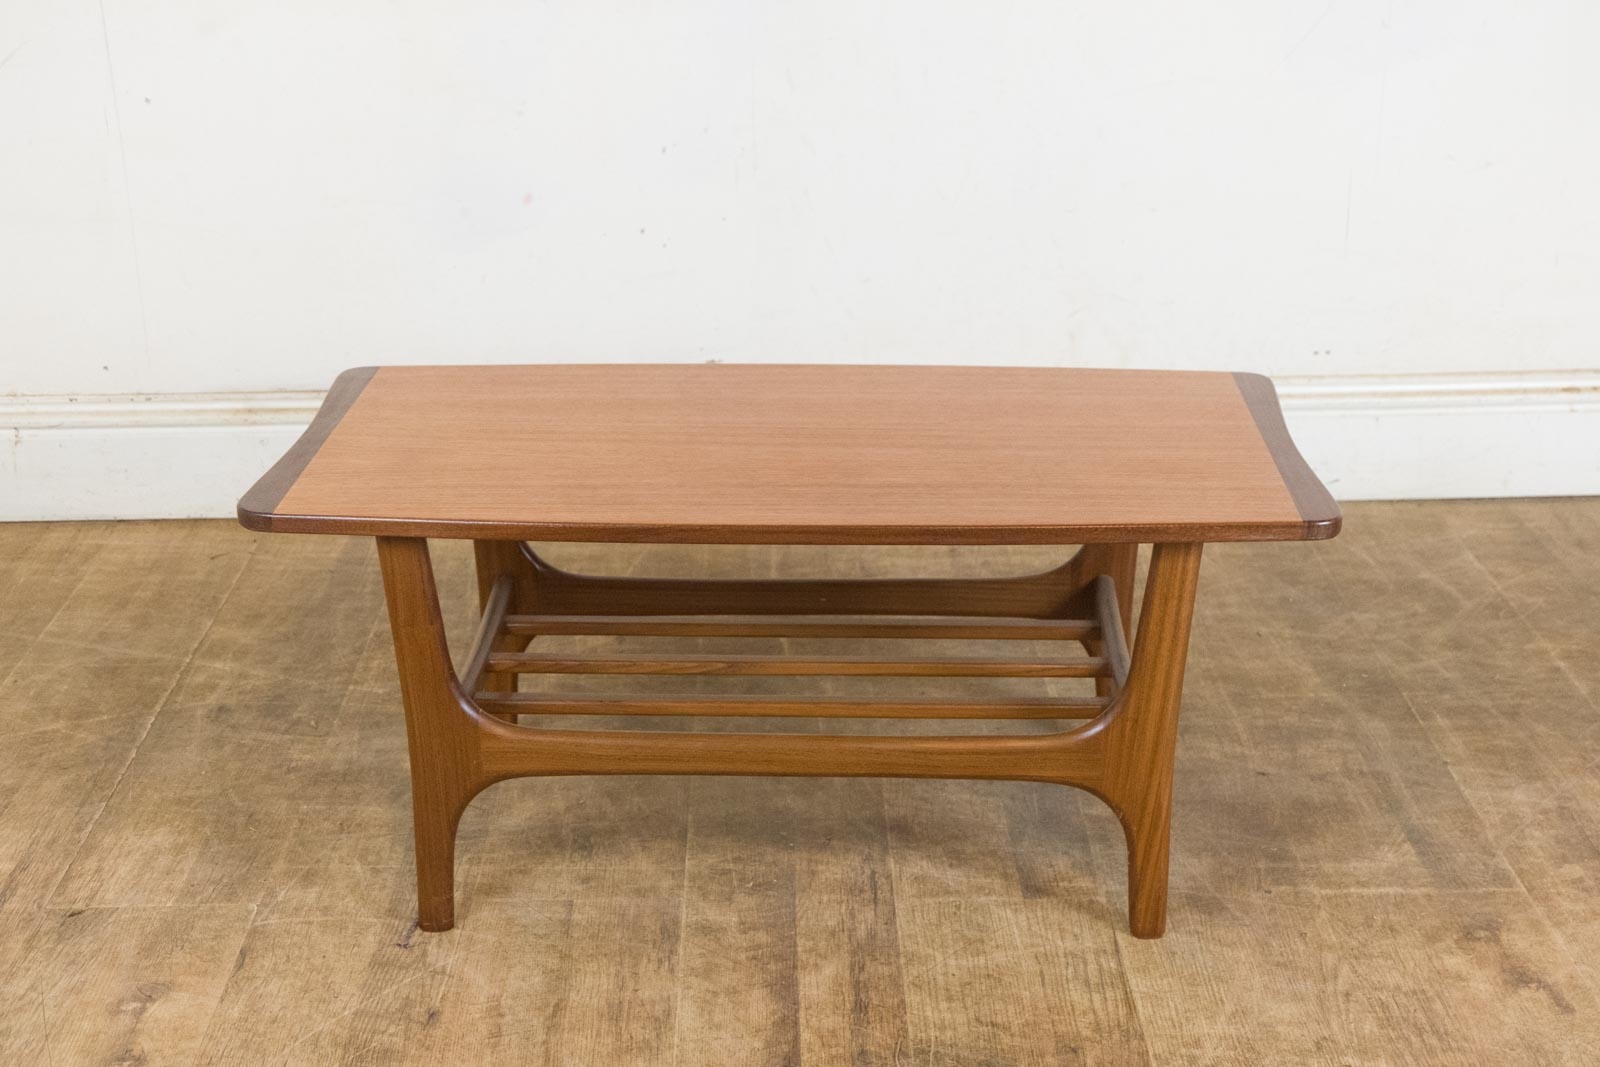 Vintage Retro Small Teak Danish Style Coffee Table | eBay